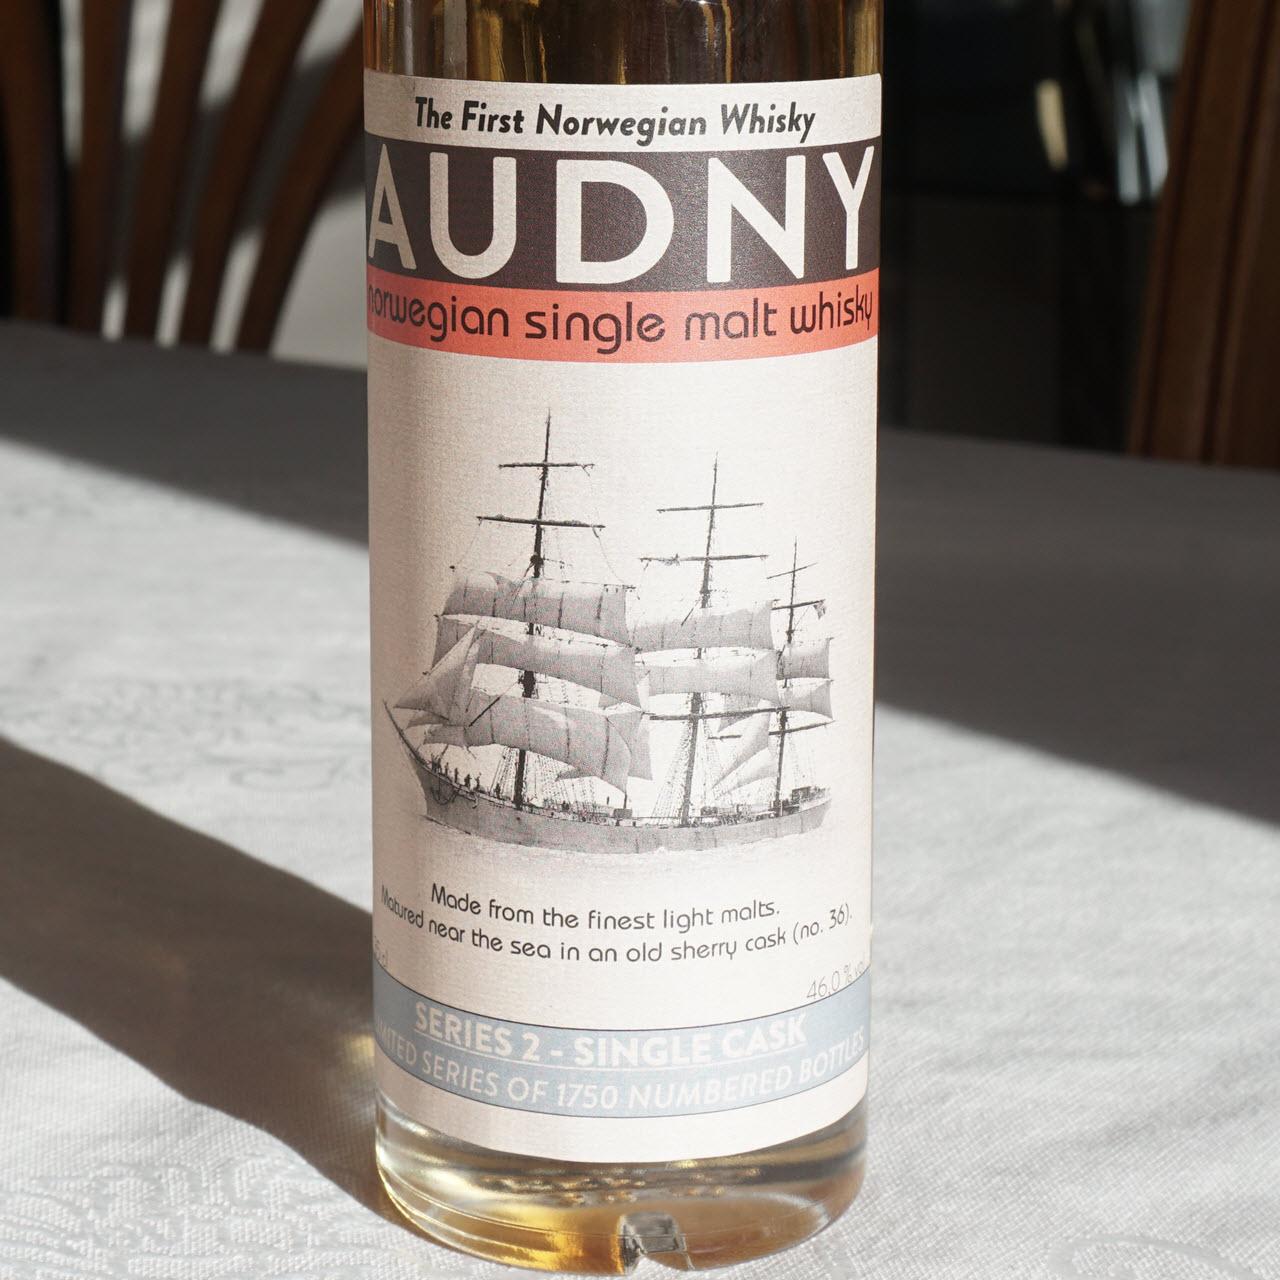 audny_series2_1.jpg